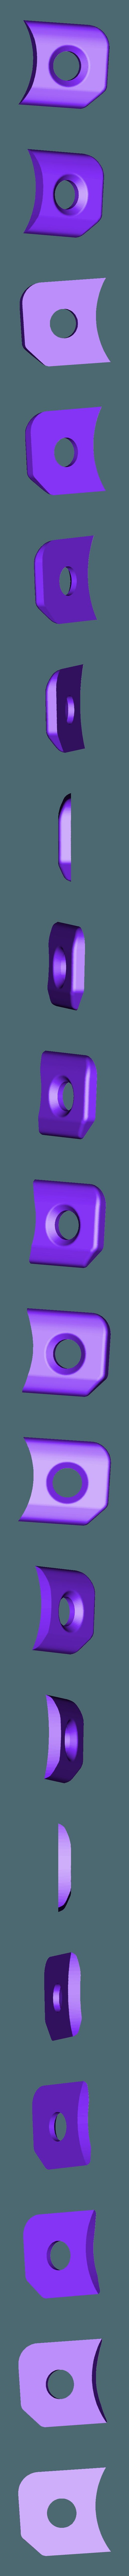 Bolster.stl Télécharger fichier STL gratuit Skinner 1 • Plan à imprimer en 3D, Theshort